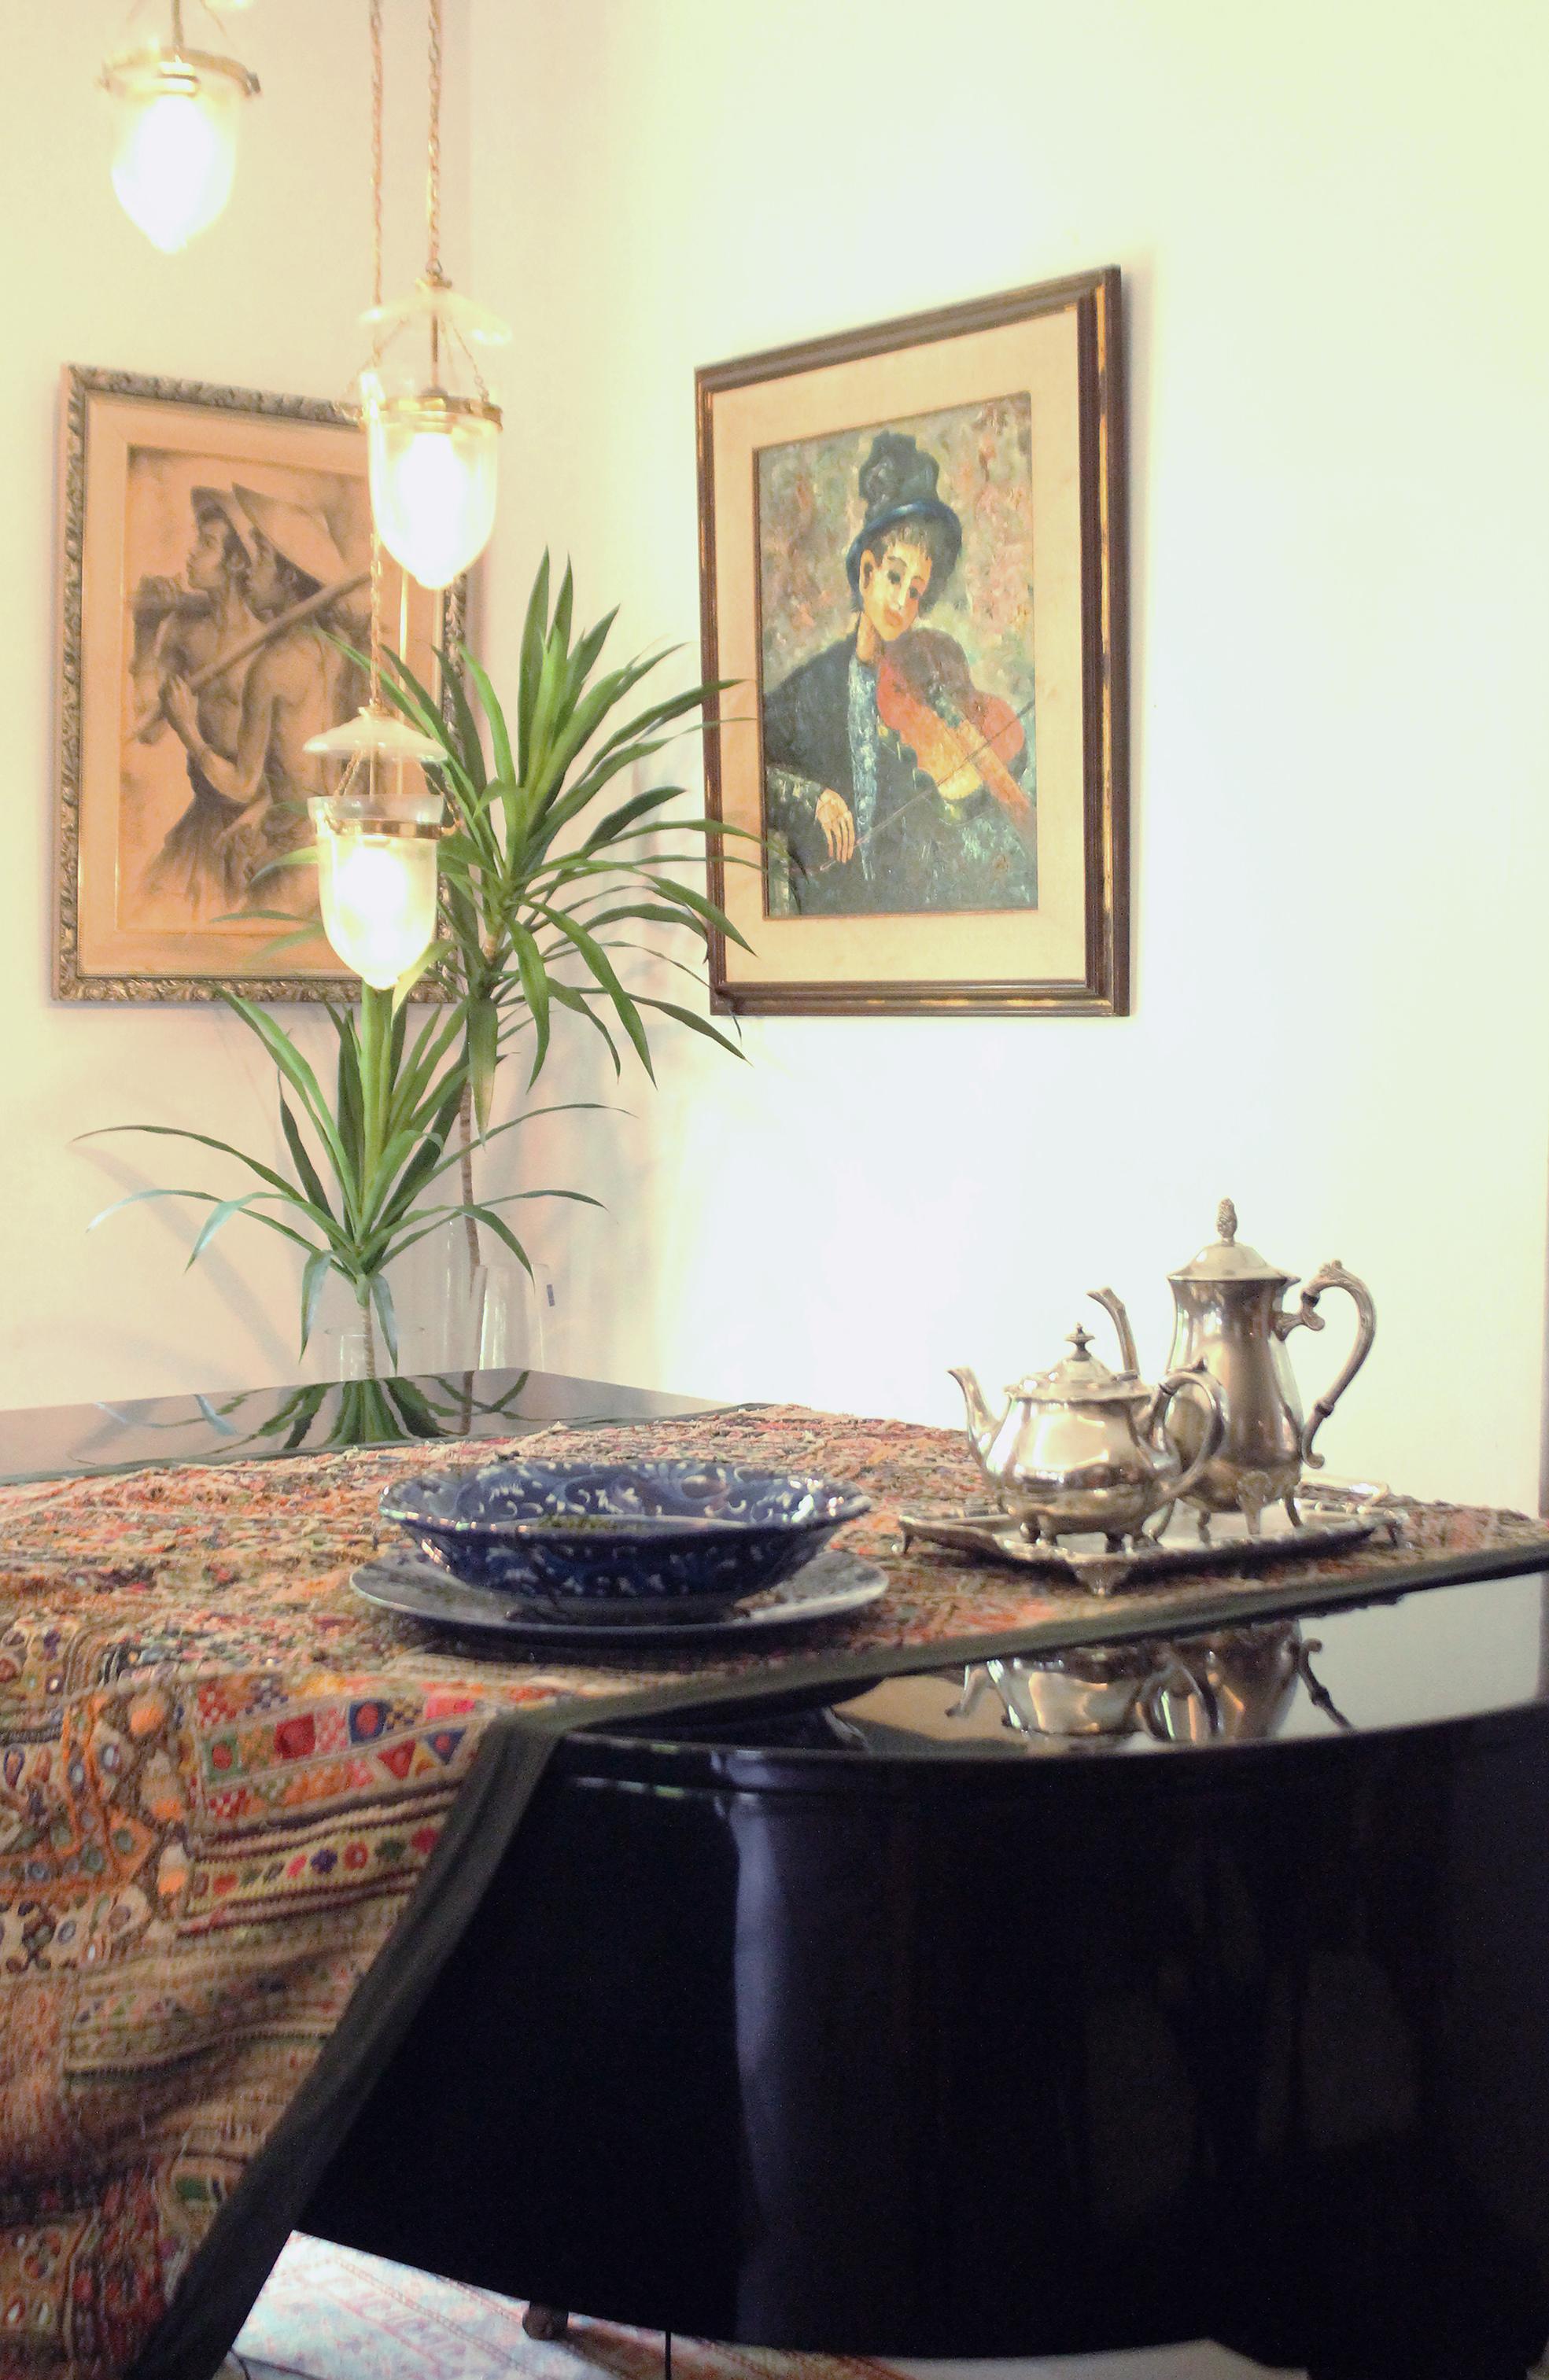 Pattern runner yang di match dengan artwork, small piece porcelain bowl, dengan latar glossy black surface dari grand piano